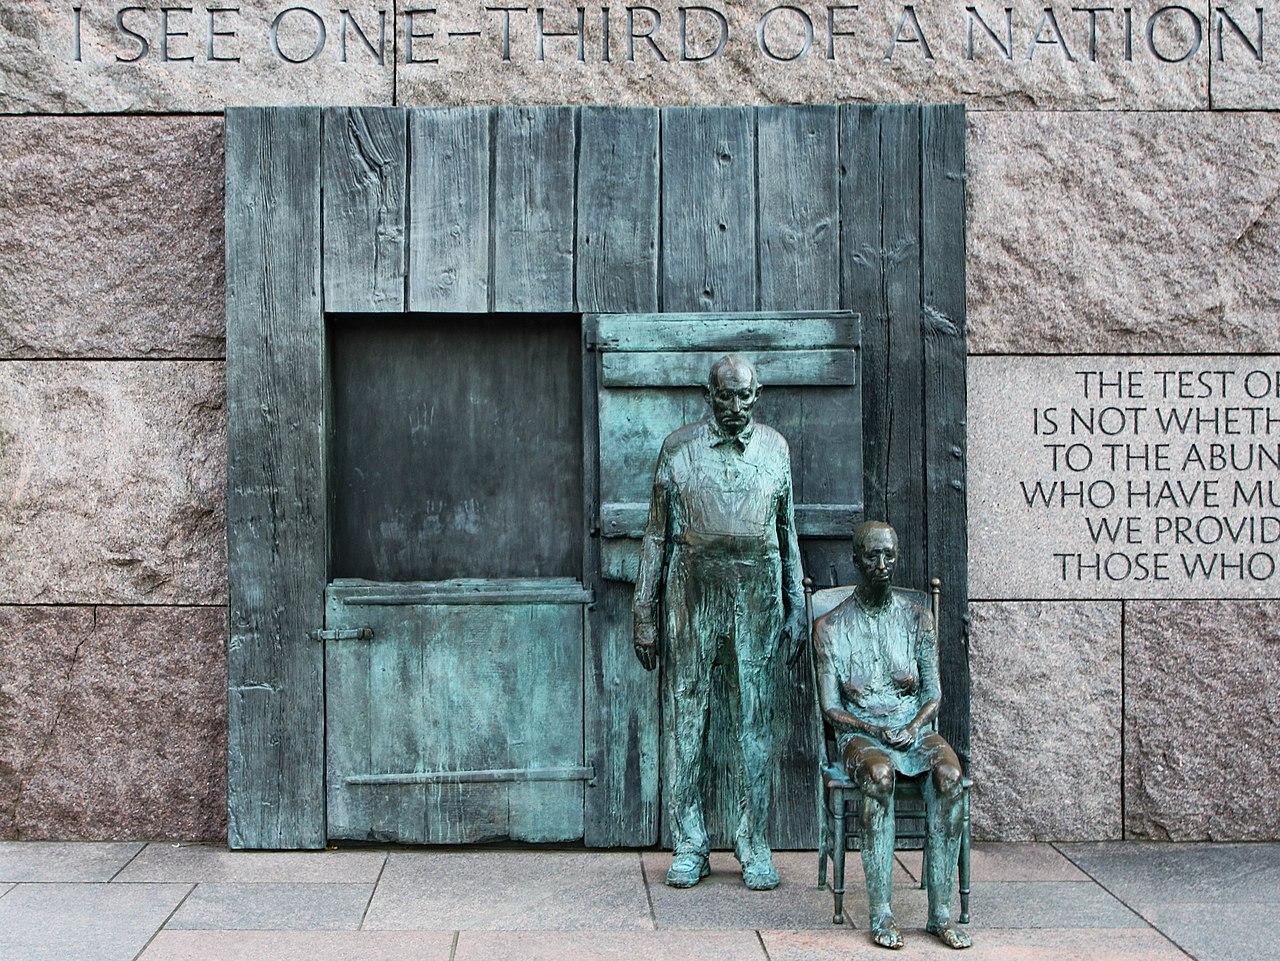 Franklin Delano Roosevelt Memorial (eedf2f05-d513-4b46-8b5d-45d7e9257caf).jpg